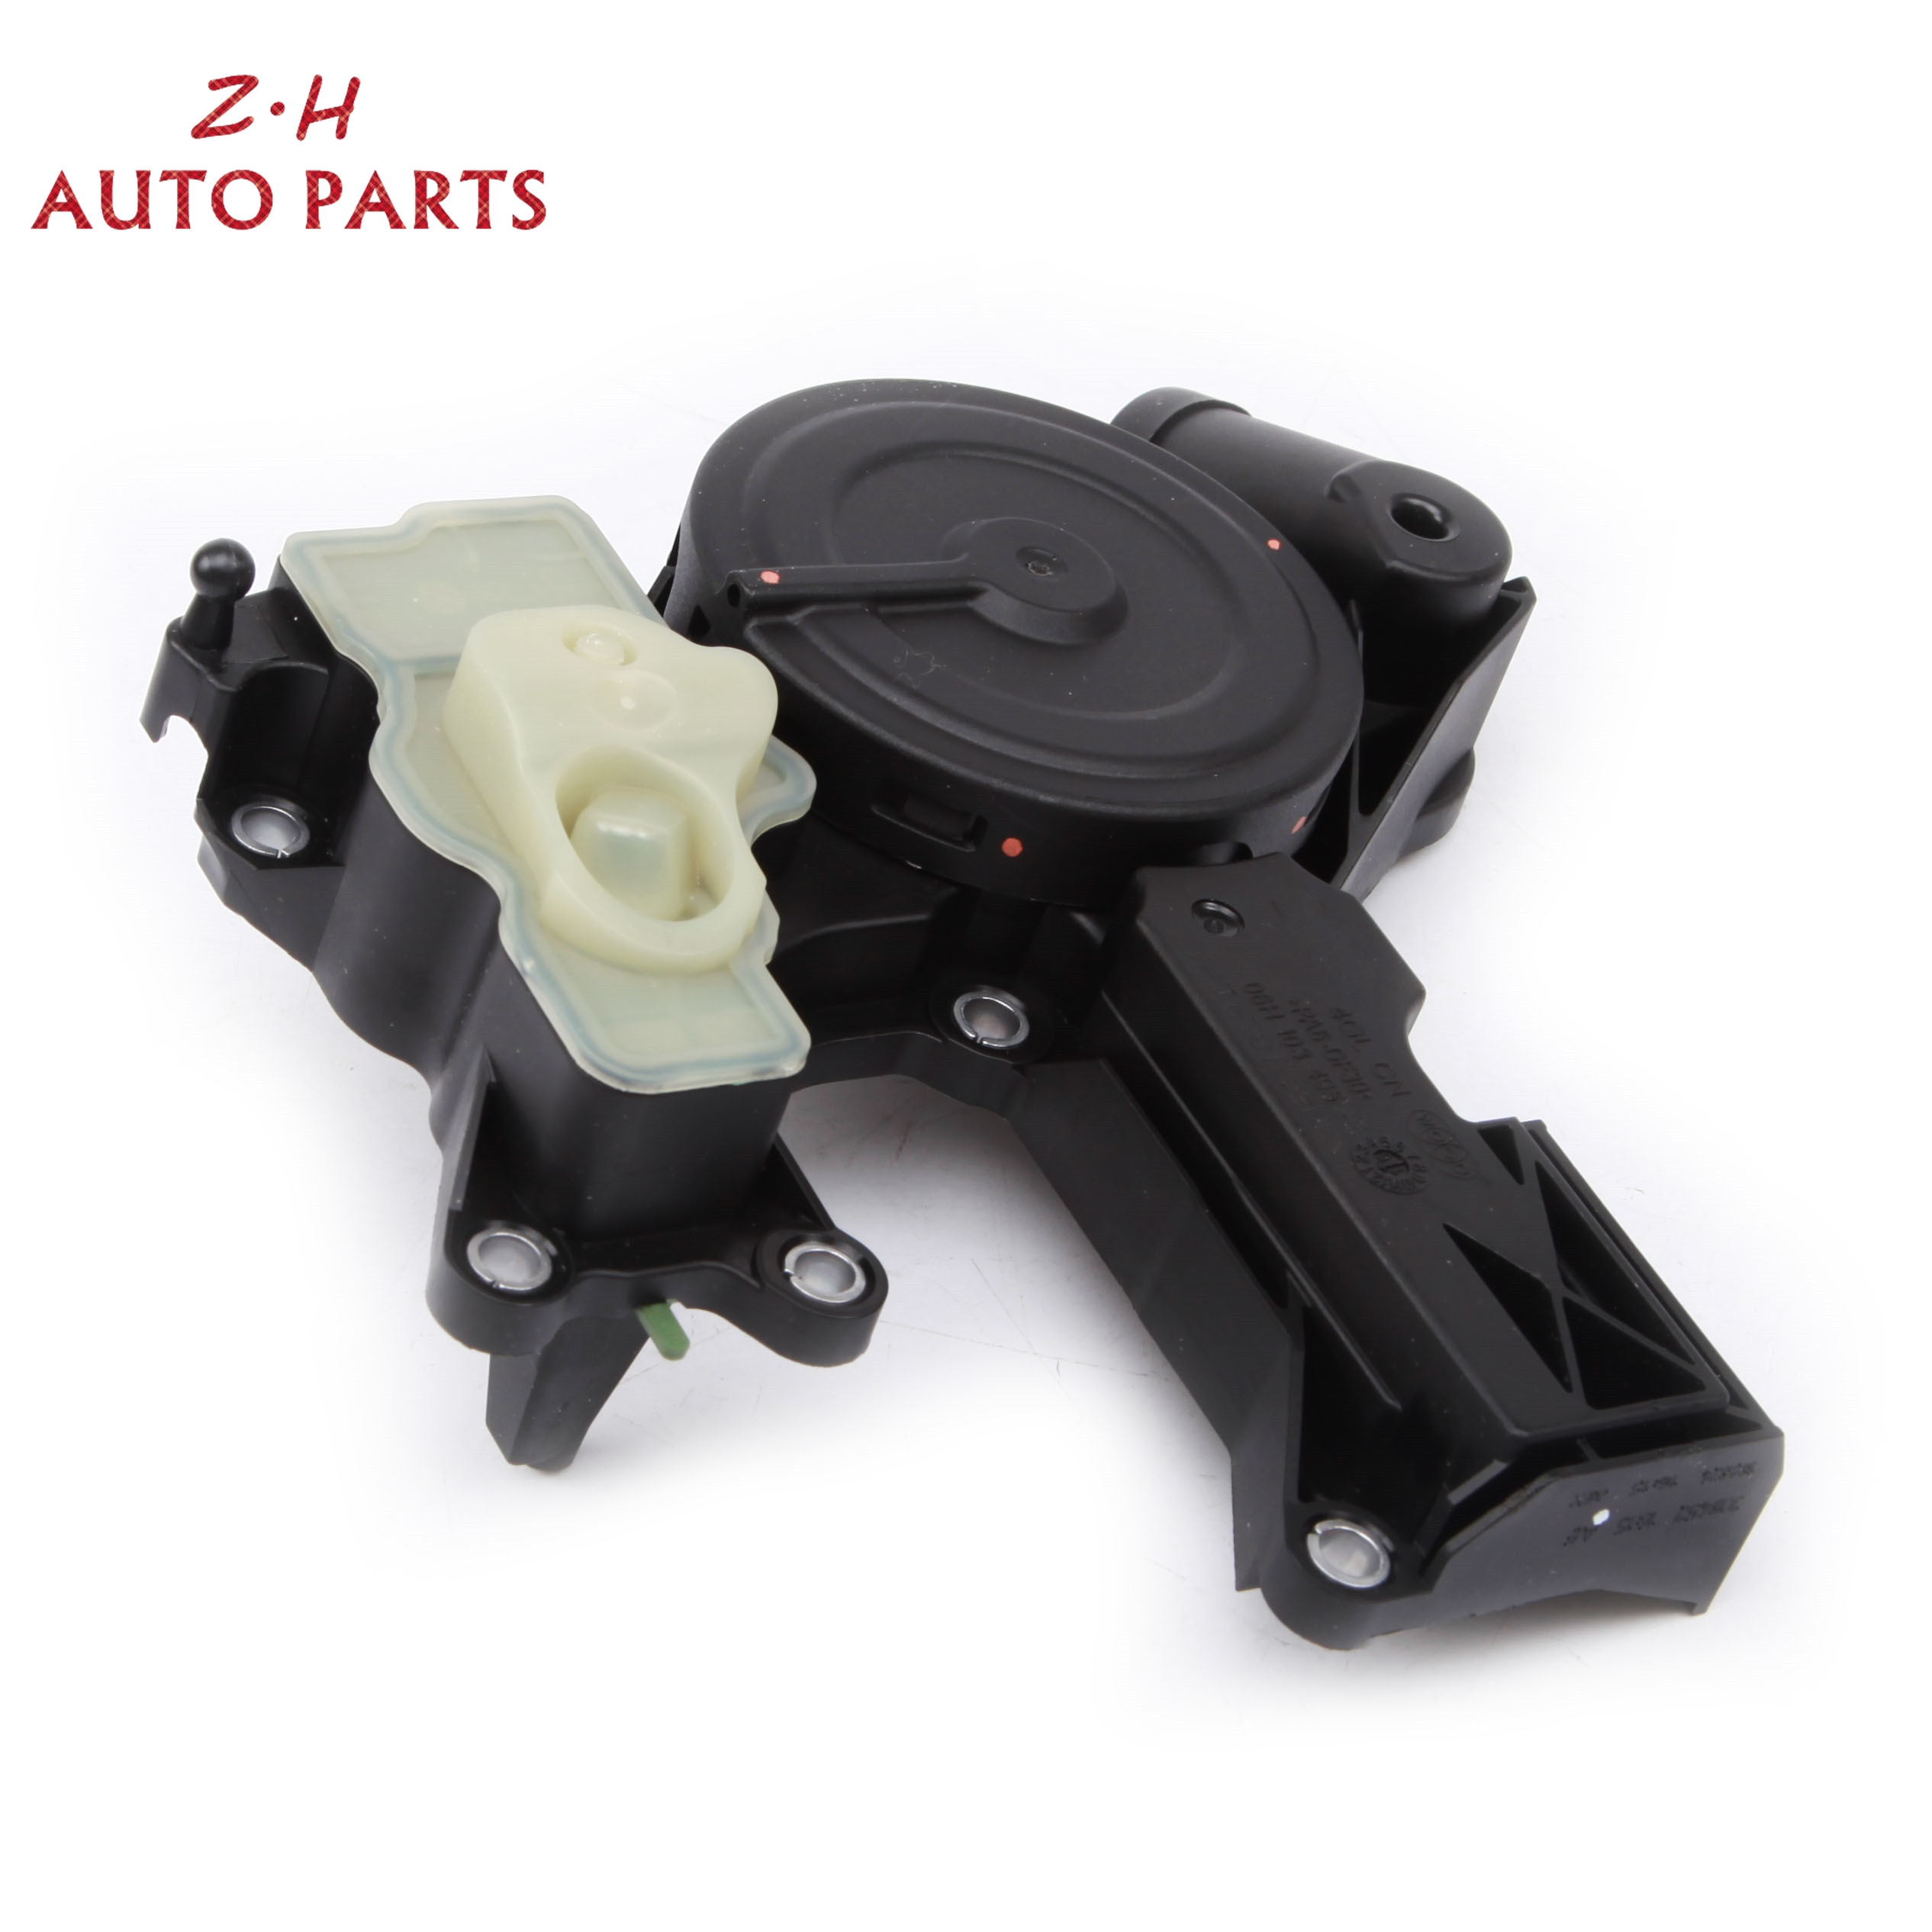 Nuevo 06H100031SX separador de agua y aceite válvula PCV para Audi A4 A5 A6 A8 Q3 Q5 Kit de reparación de separador de agua y aceite 06H103495AE 06H103495J